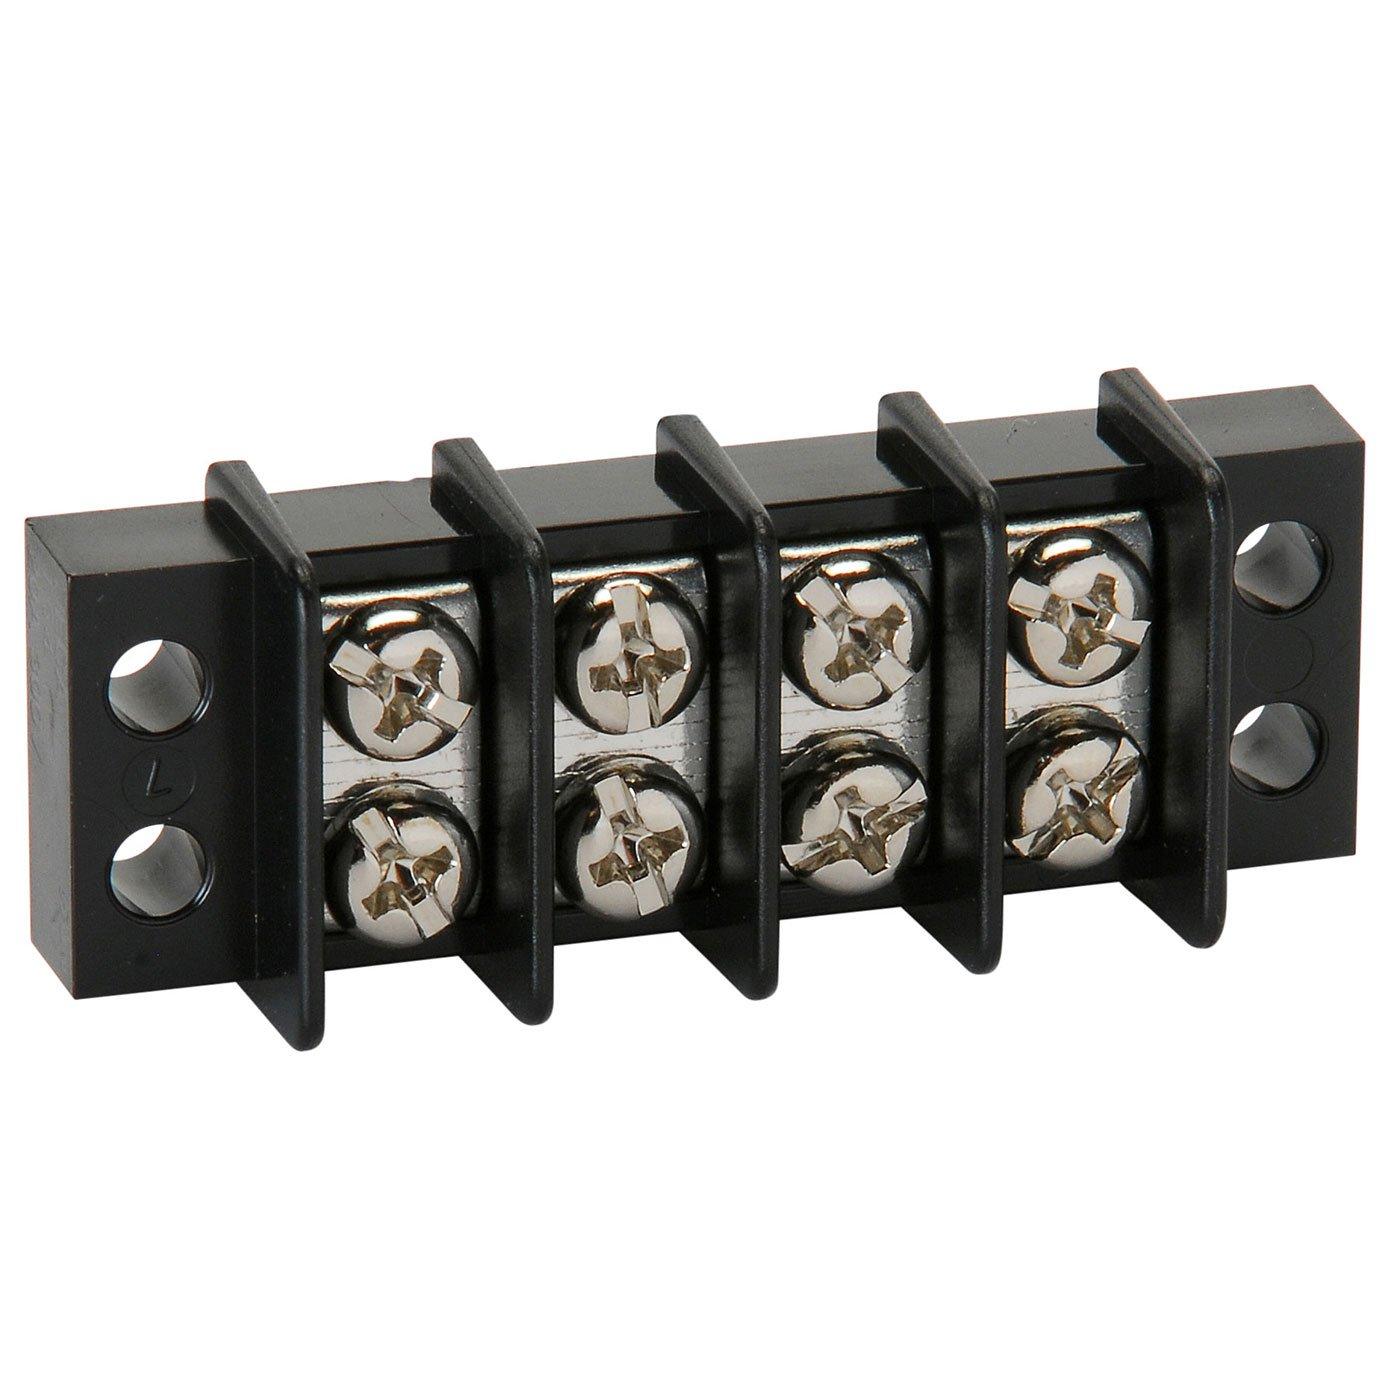 NTE Electronics 25-B500-04 Series 25-B500 Terminal Block Barrier Strip, Dual Row Panel Mount, 20 Amp, Dual Row, 4 Pole, 9.50 mm Pitch, 300V, 22-14 AWG Wire Range